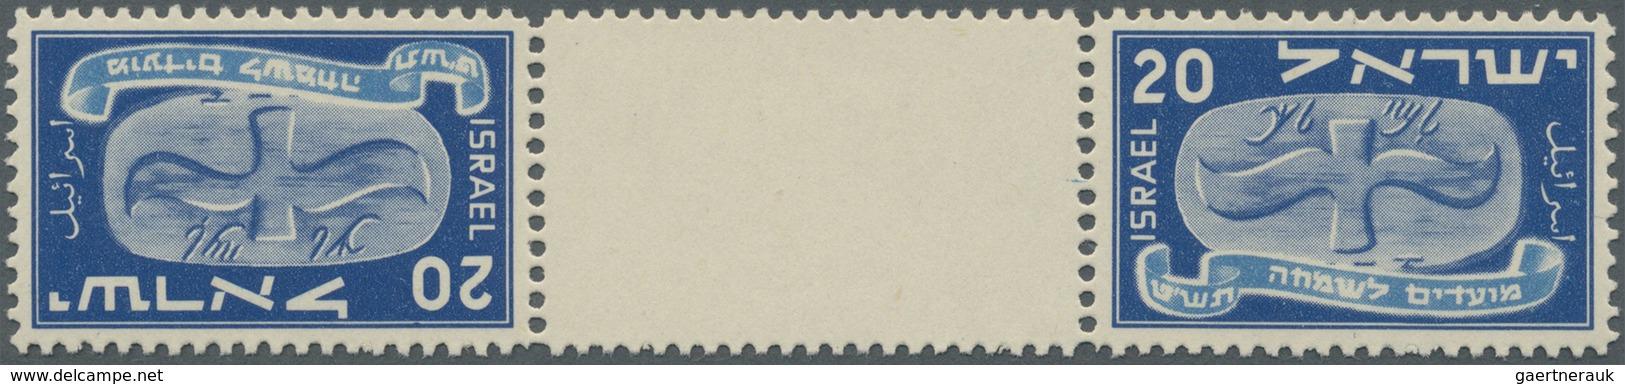 ** Israel: 1948, 20m. Horizontal Téte-béche Gutter Pair With Missing Perforation Through Gutter, Mint N - Israel